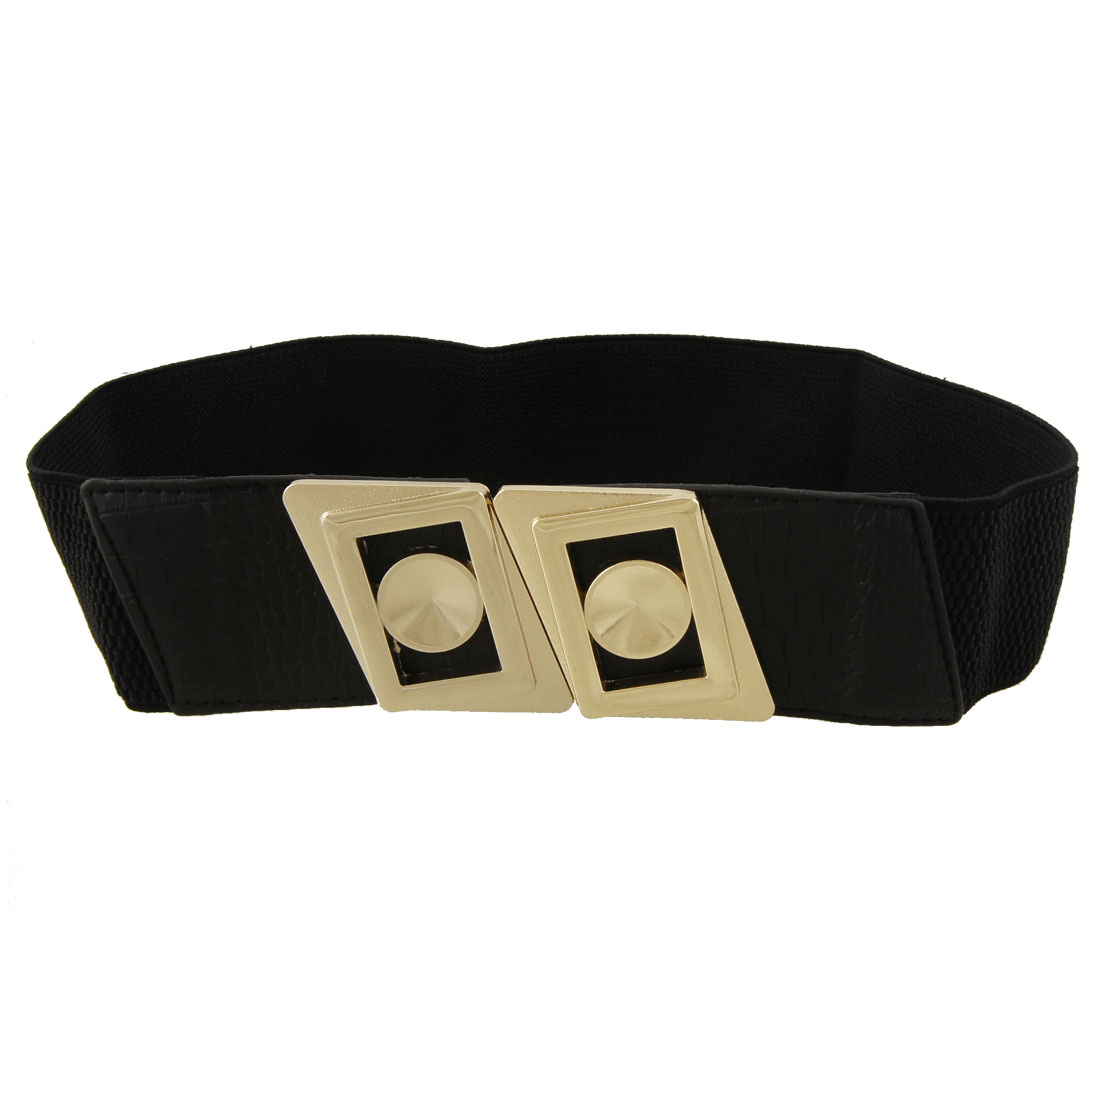 Metal Double Parallelogram Buckle Black Elastic Cinch Belt for Lady